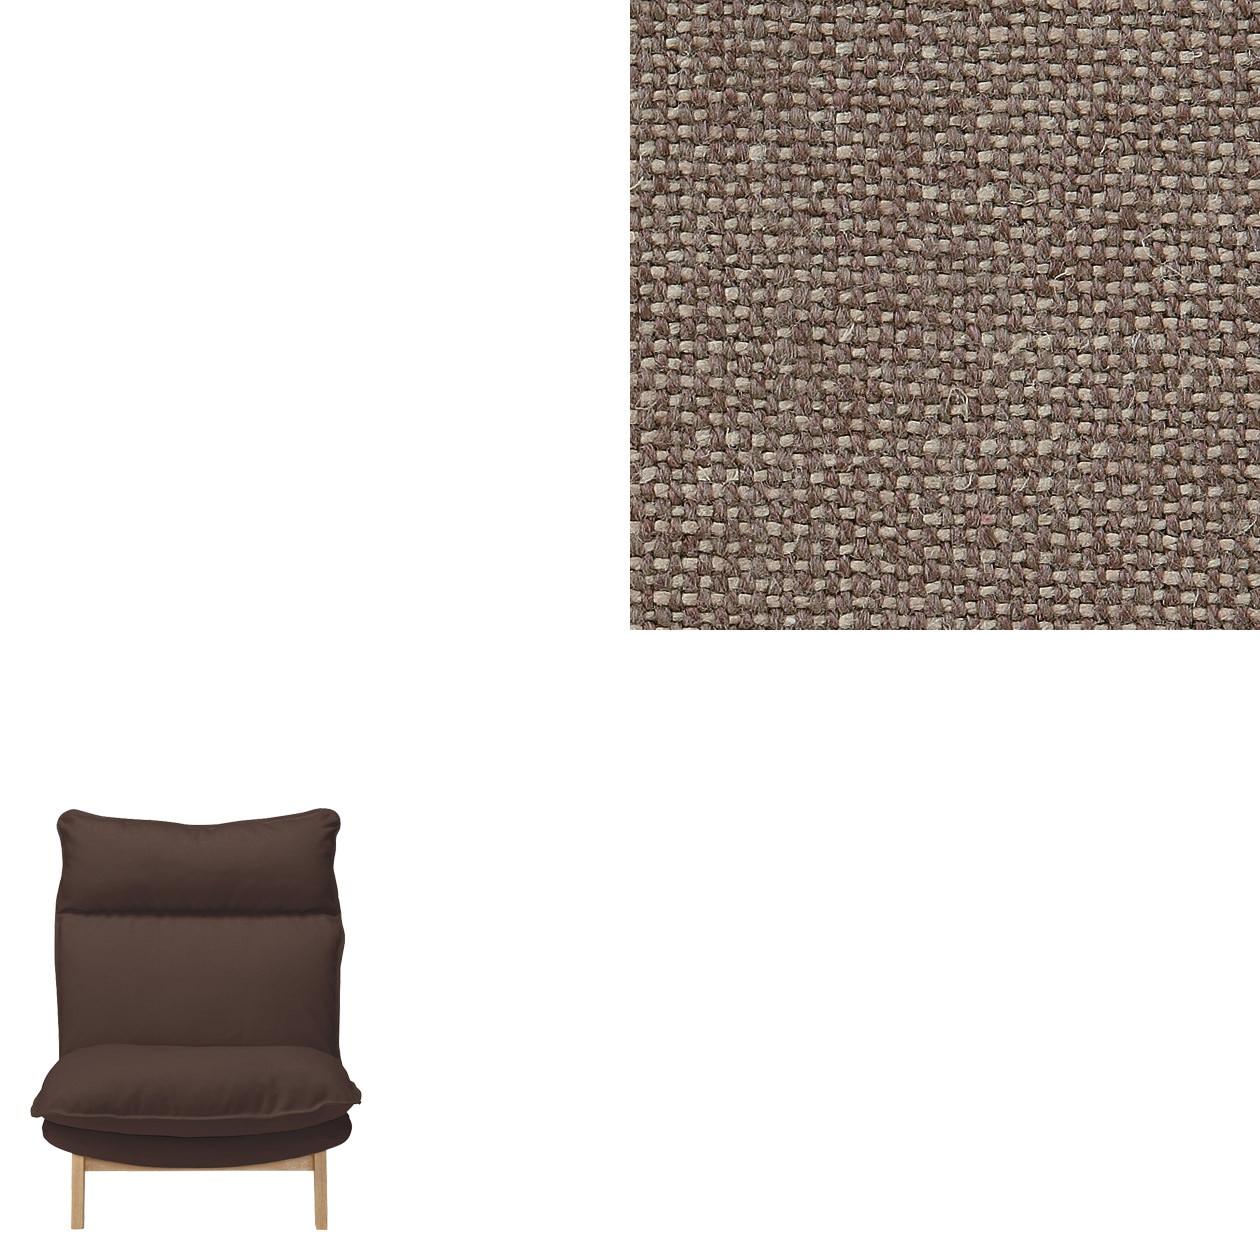 Brilliant Linen Cotton Cover High Back Reclining Sofa 1S Br Muji Evergreenethics Interior Chair Design Evergreenethicsorg